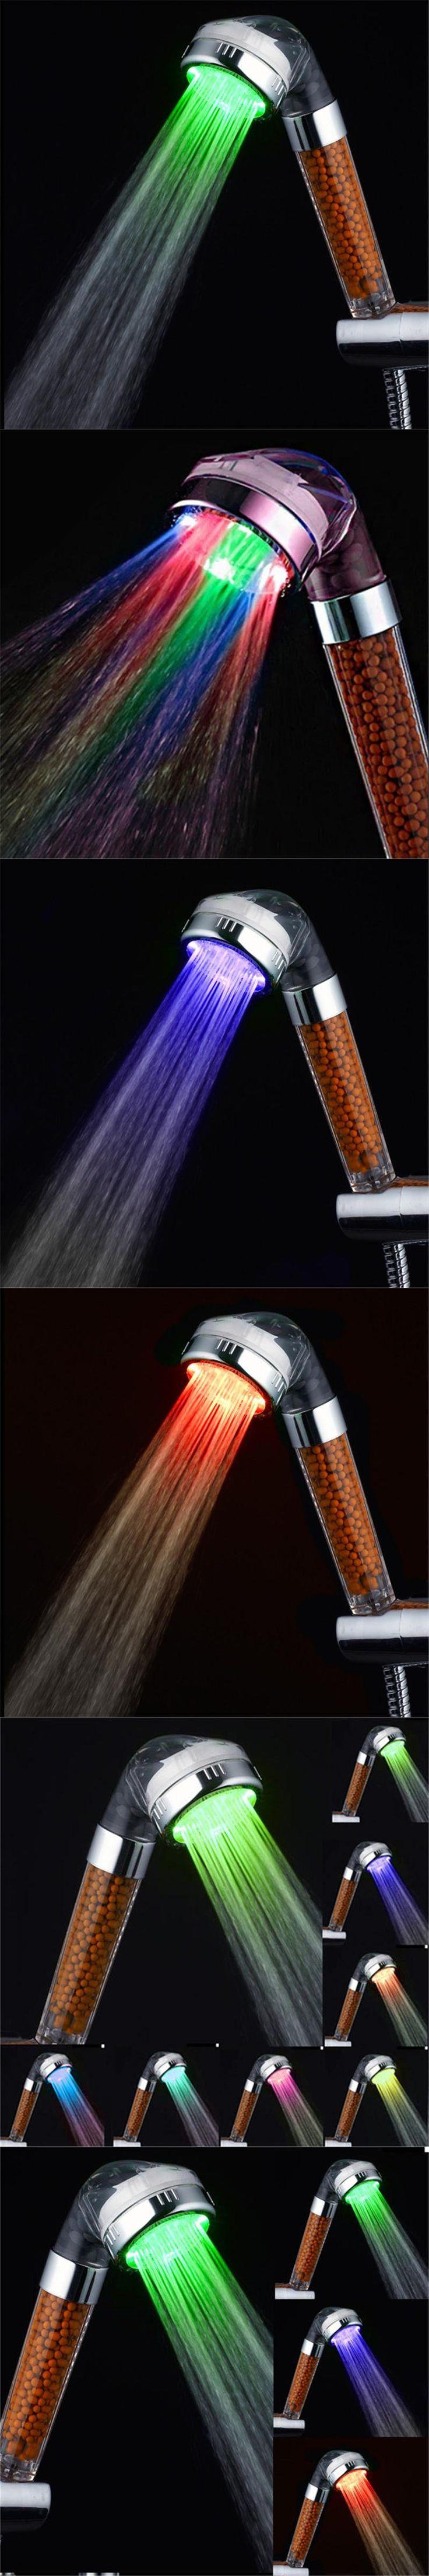 Free Shipping Led shower Tourmaline SPA Anion Hand Held Bathroom Led Shower Head Filter Hand Shower Pressurize Saving Water